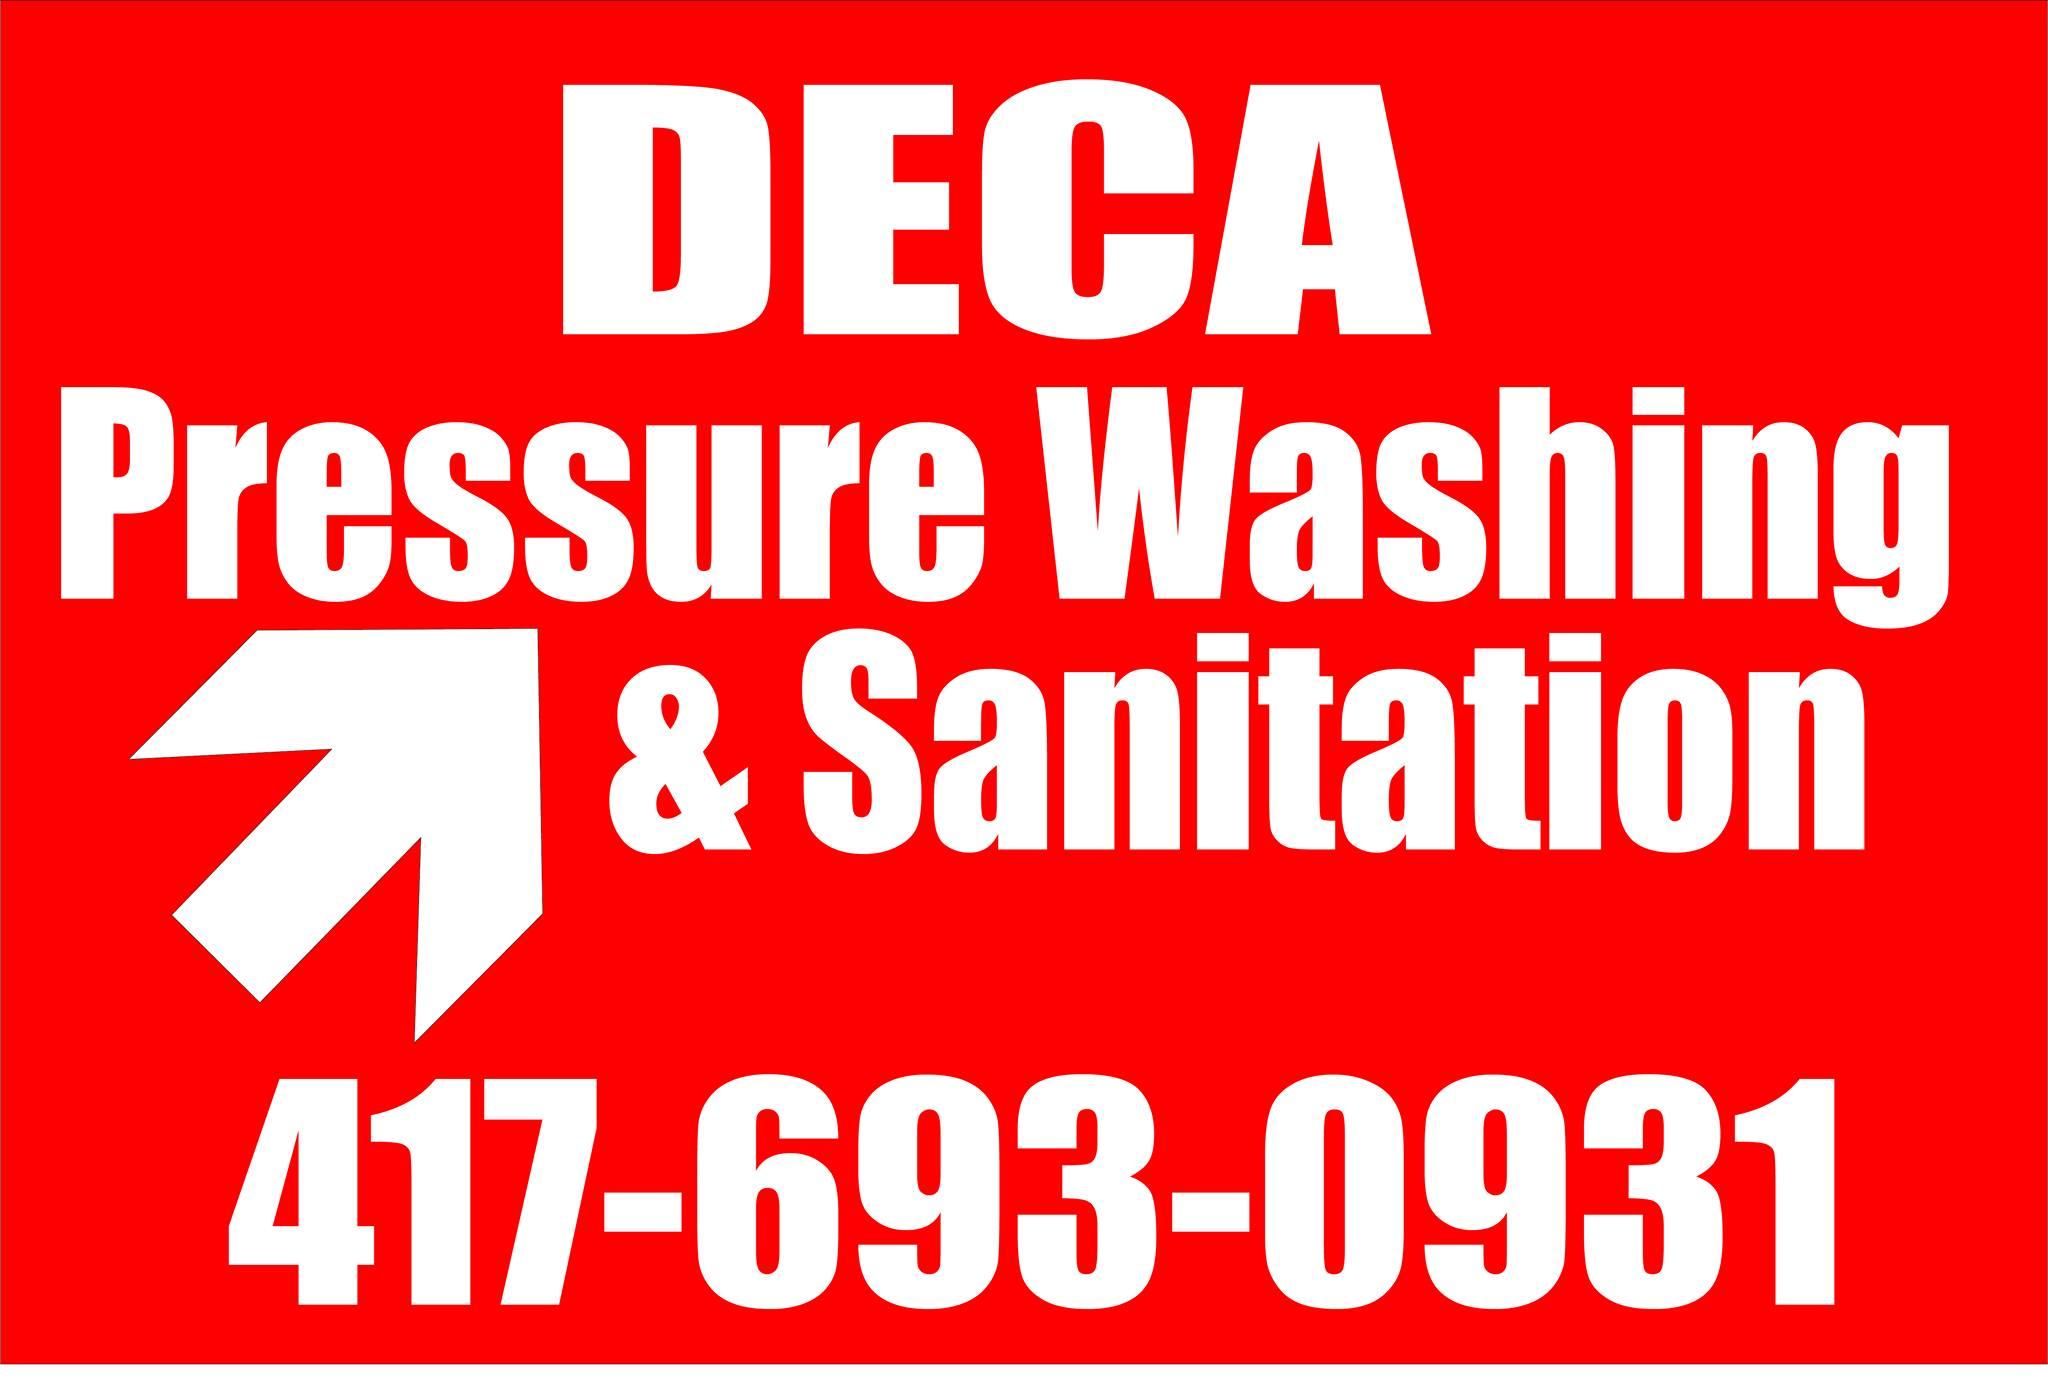 Deca Pressure Washing